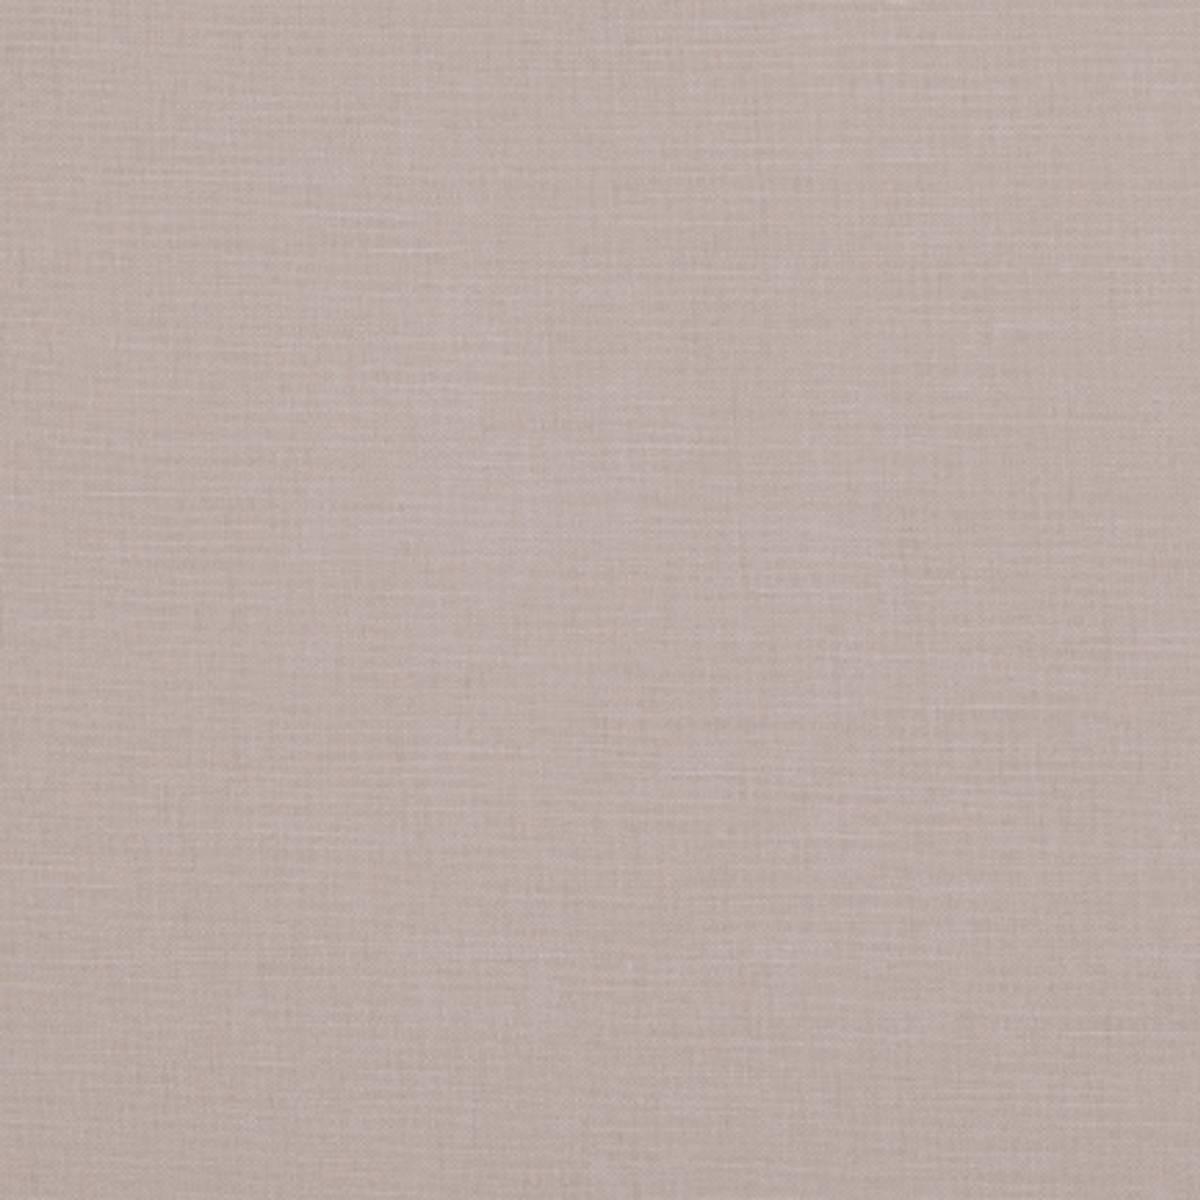 Linara Fabric Plaster 2494 467 Romo Linara Neutrals